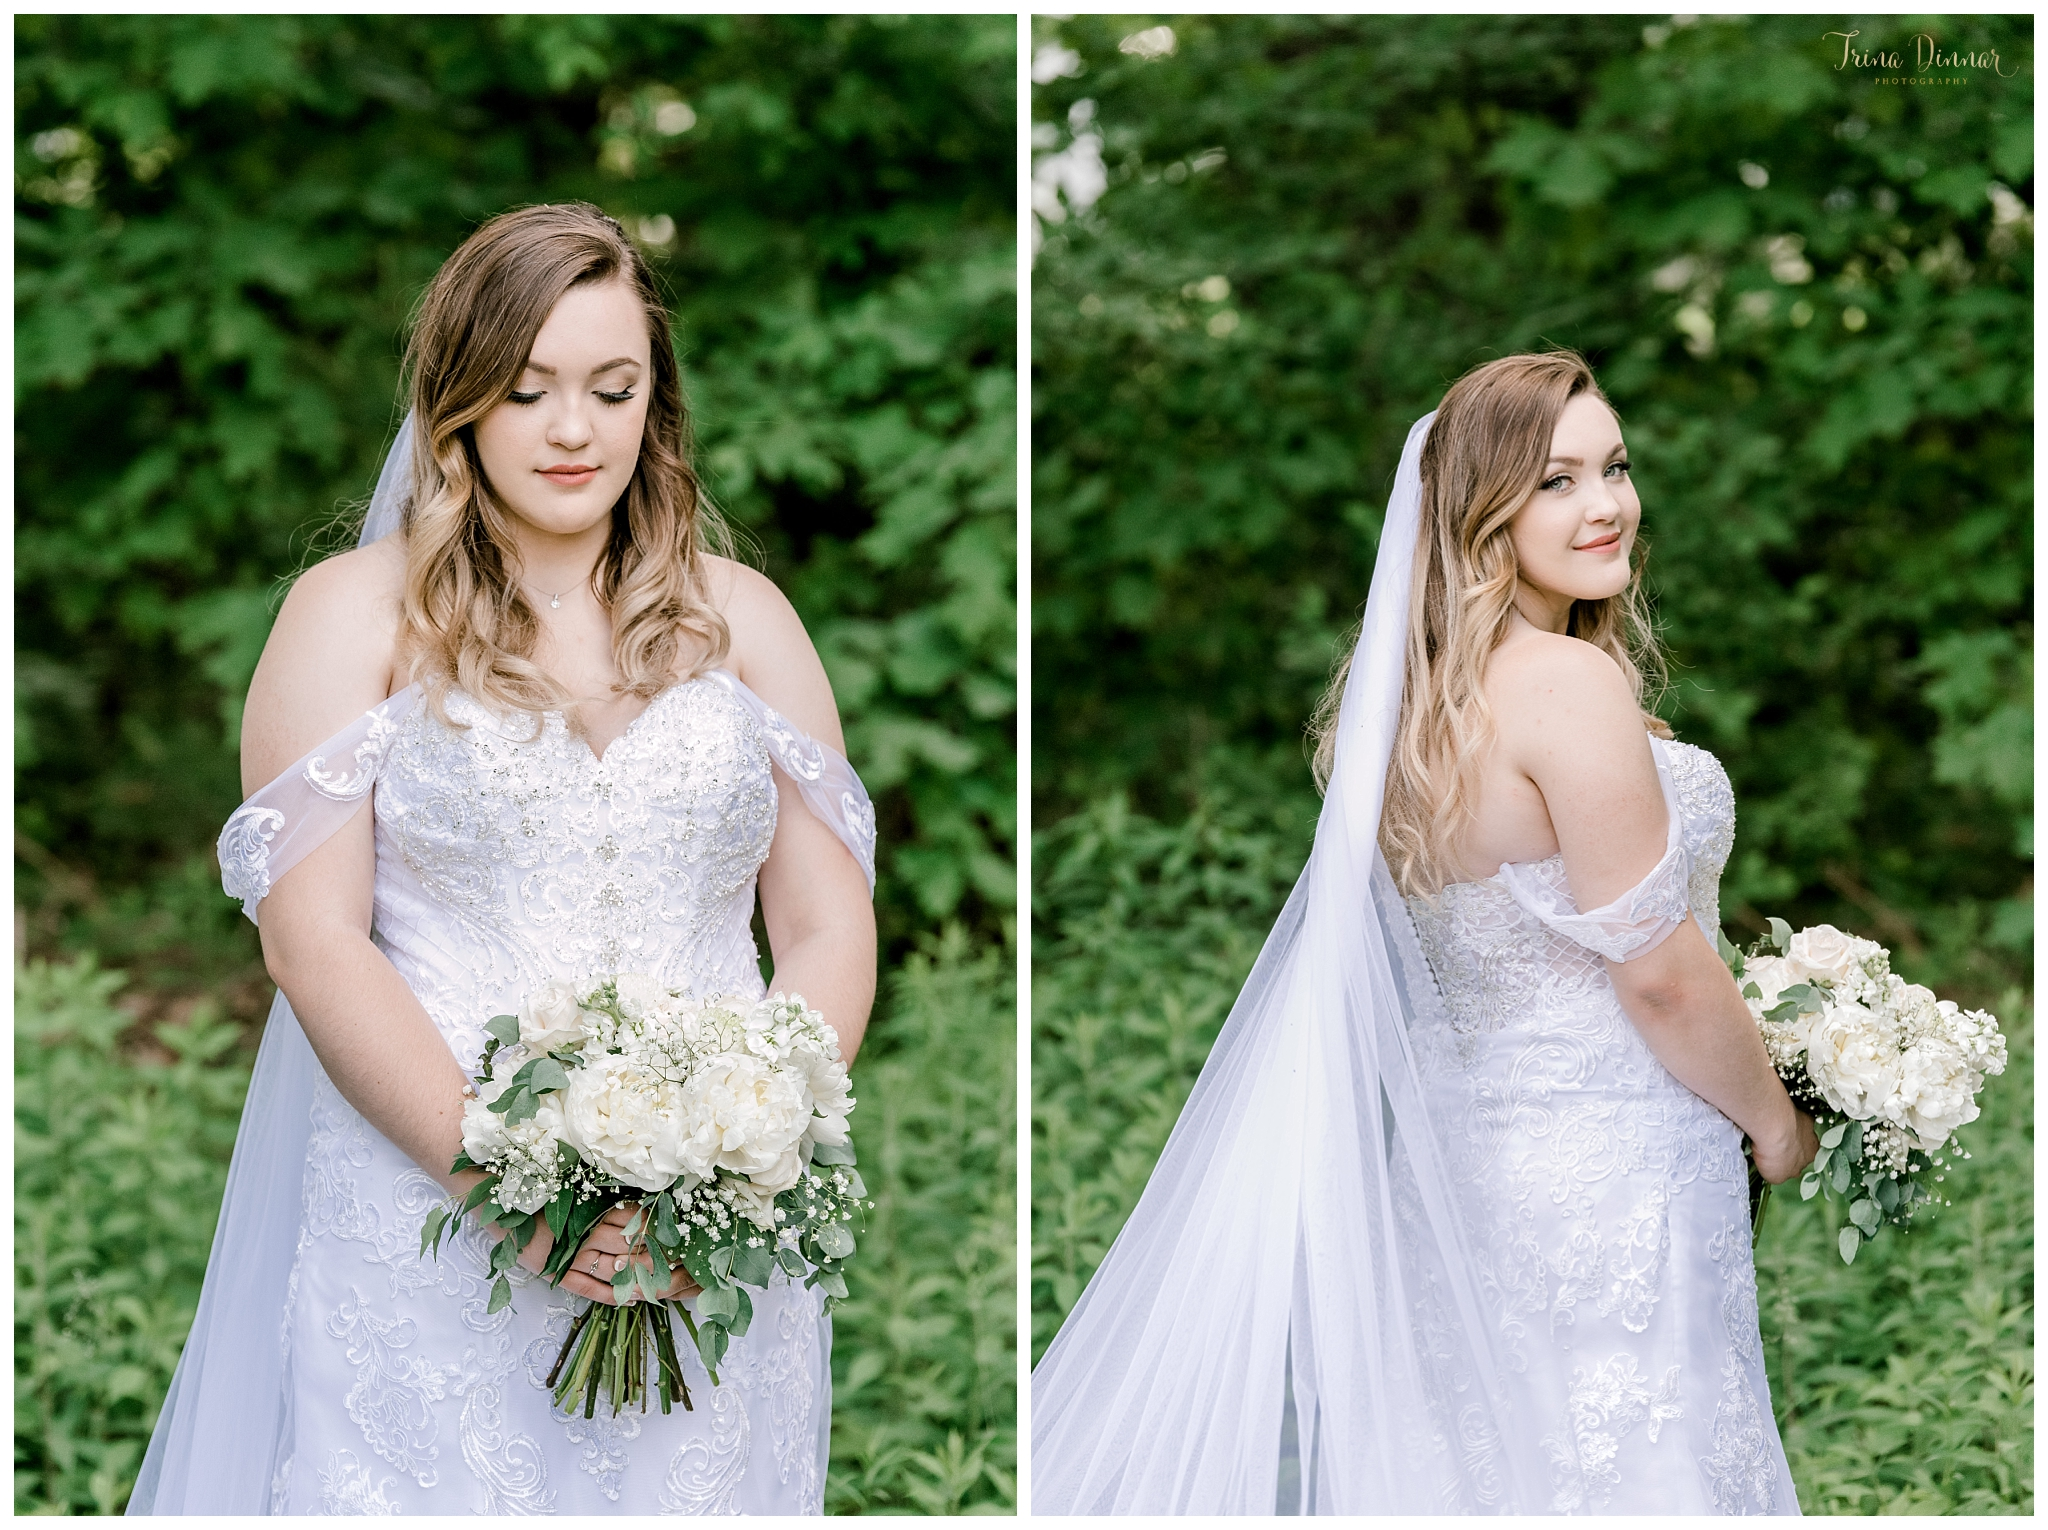 Bristol Maine Bridal Wedding Day Portraits